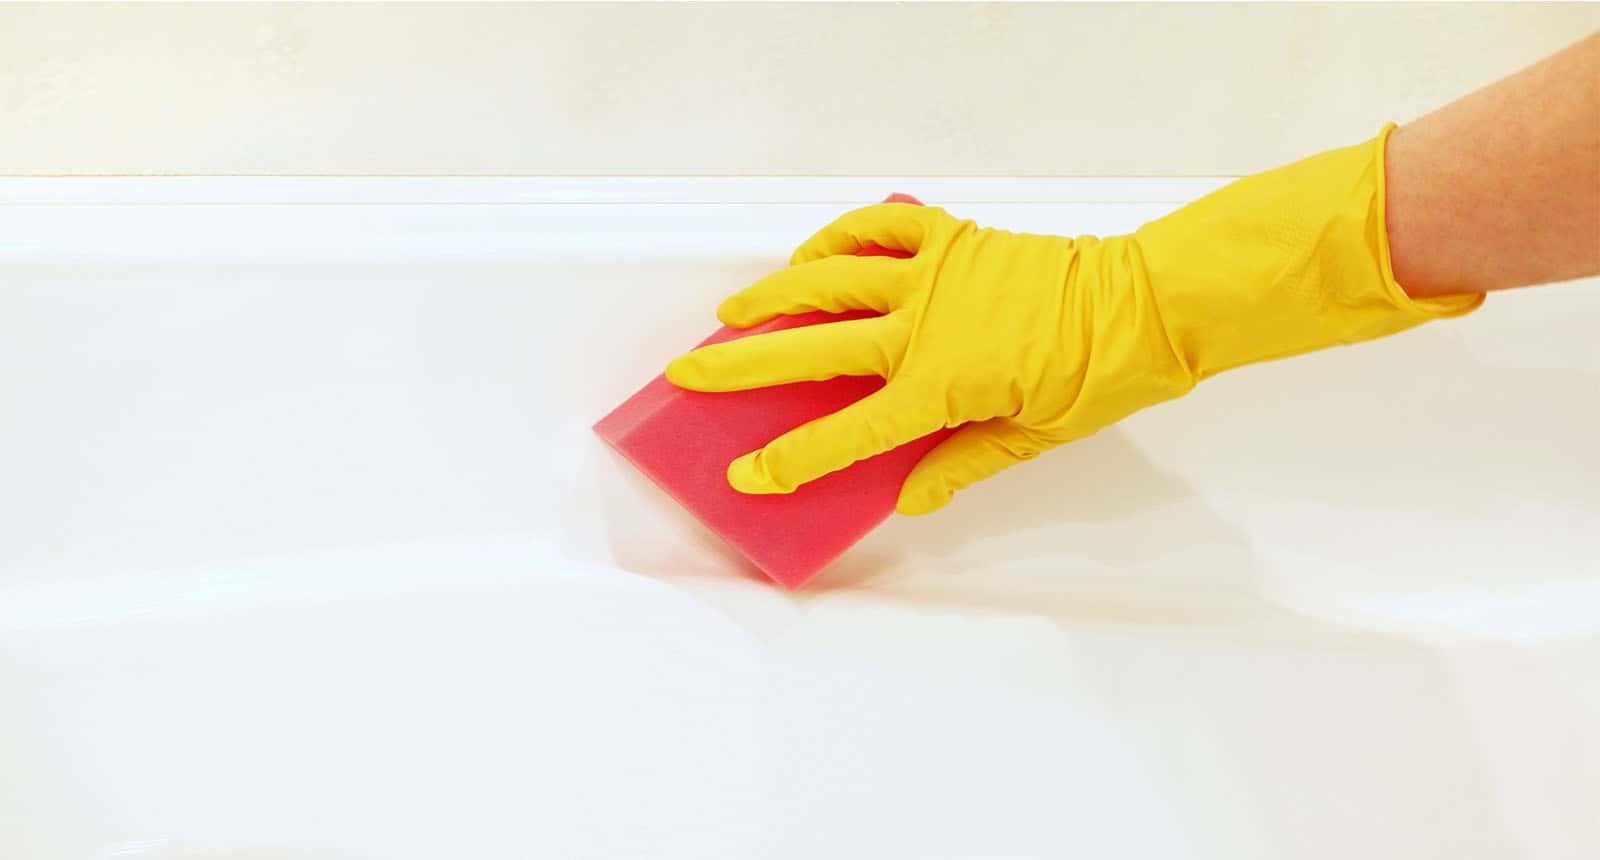 Hand Yellow Rubber Glove